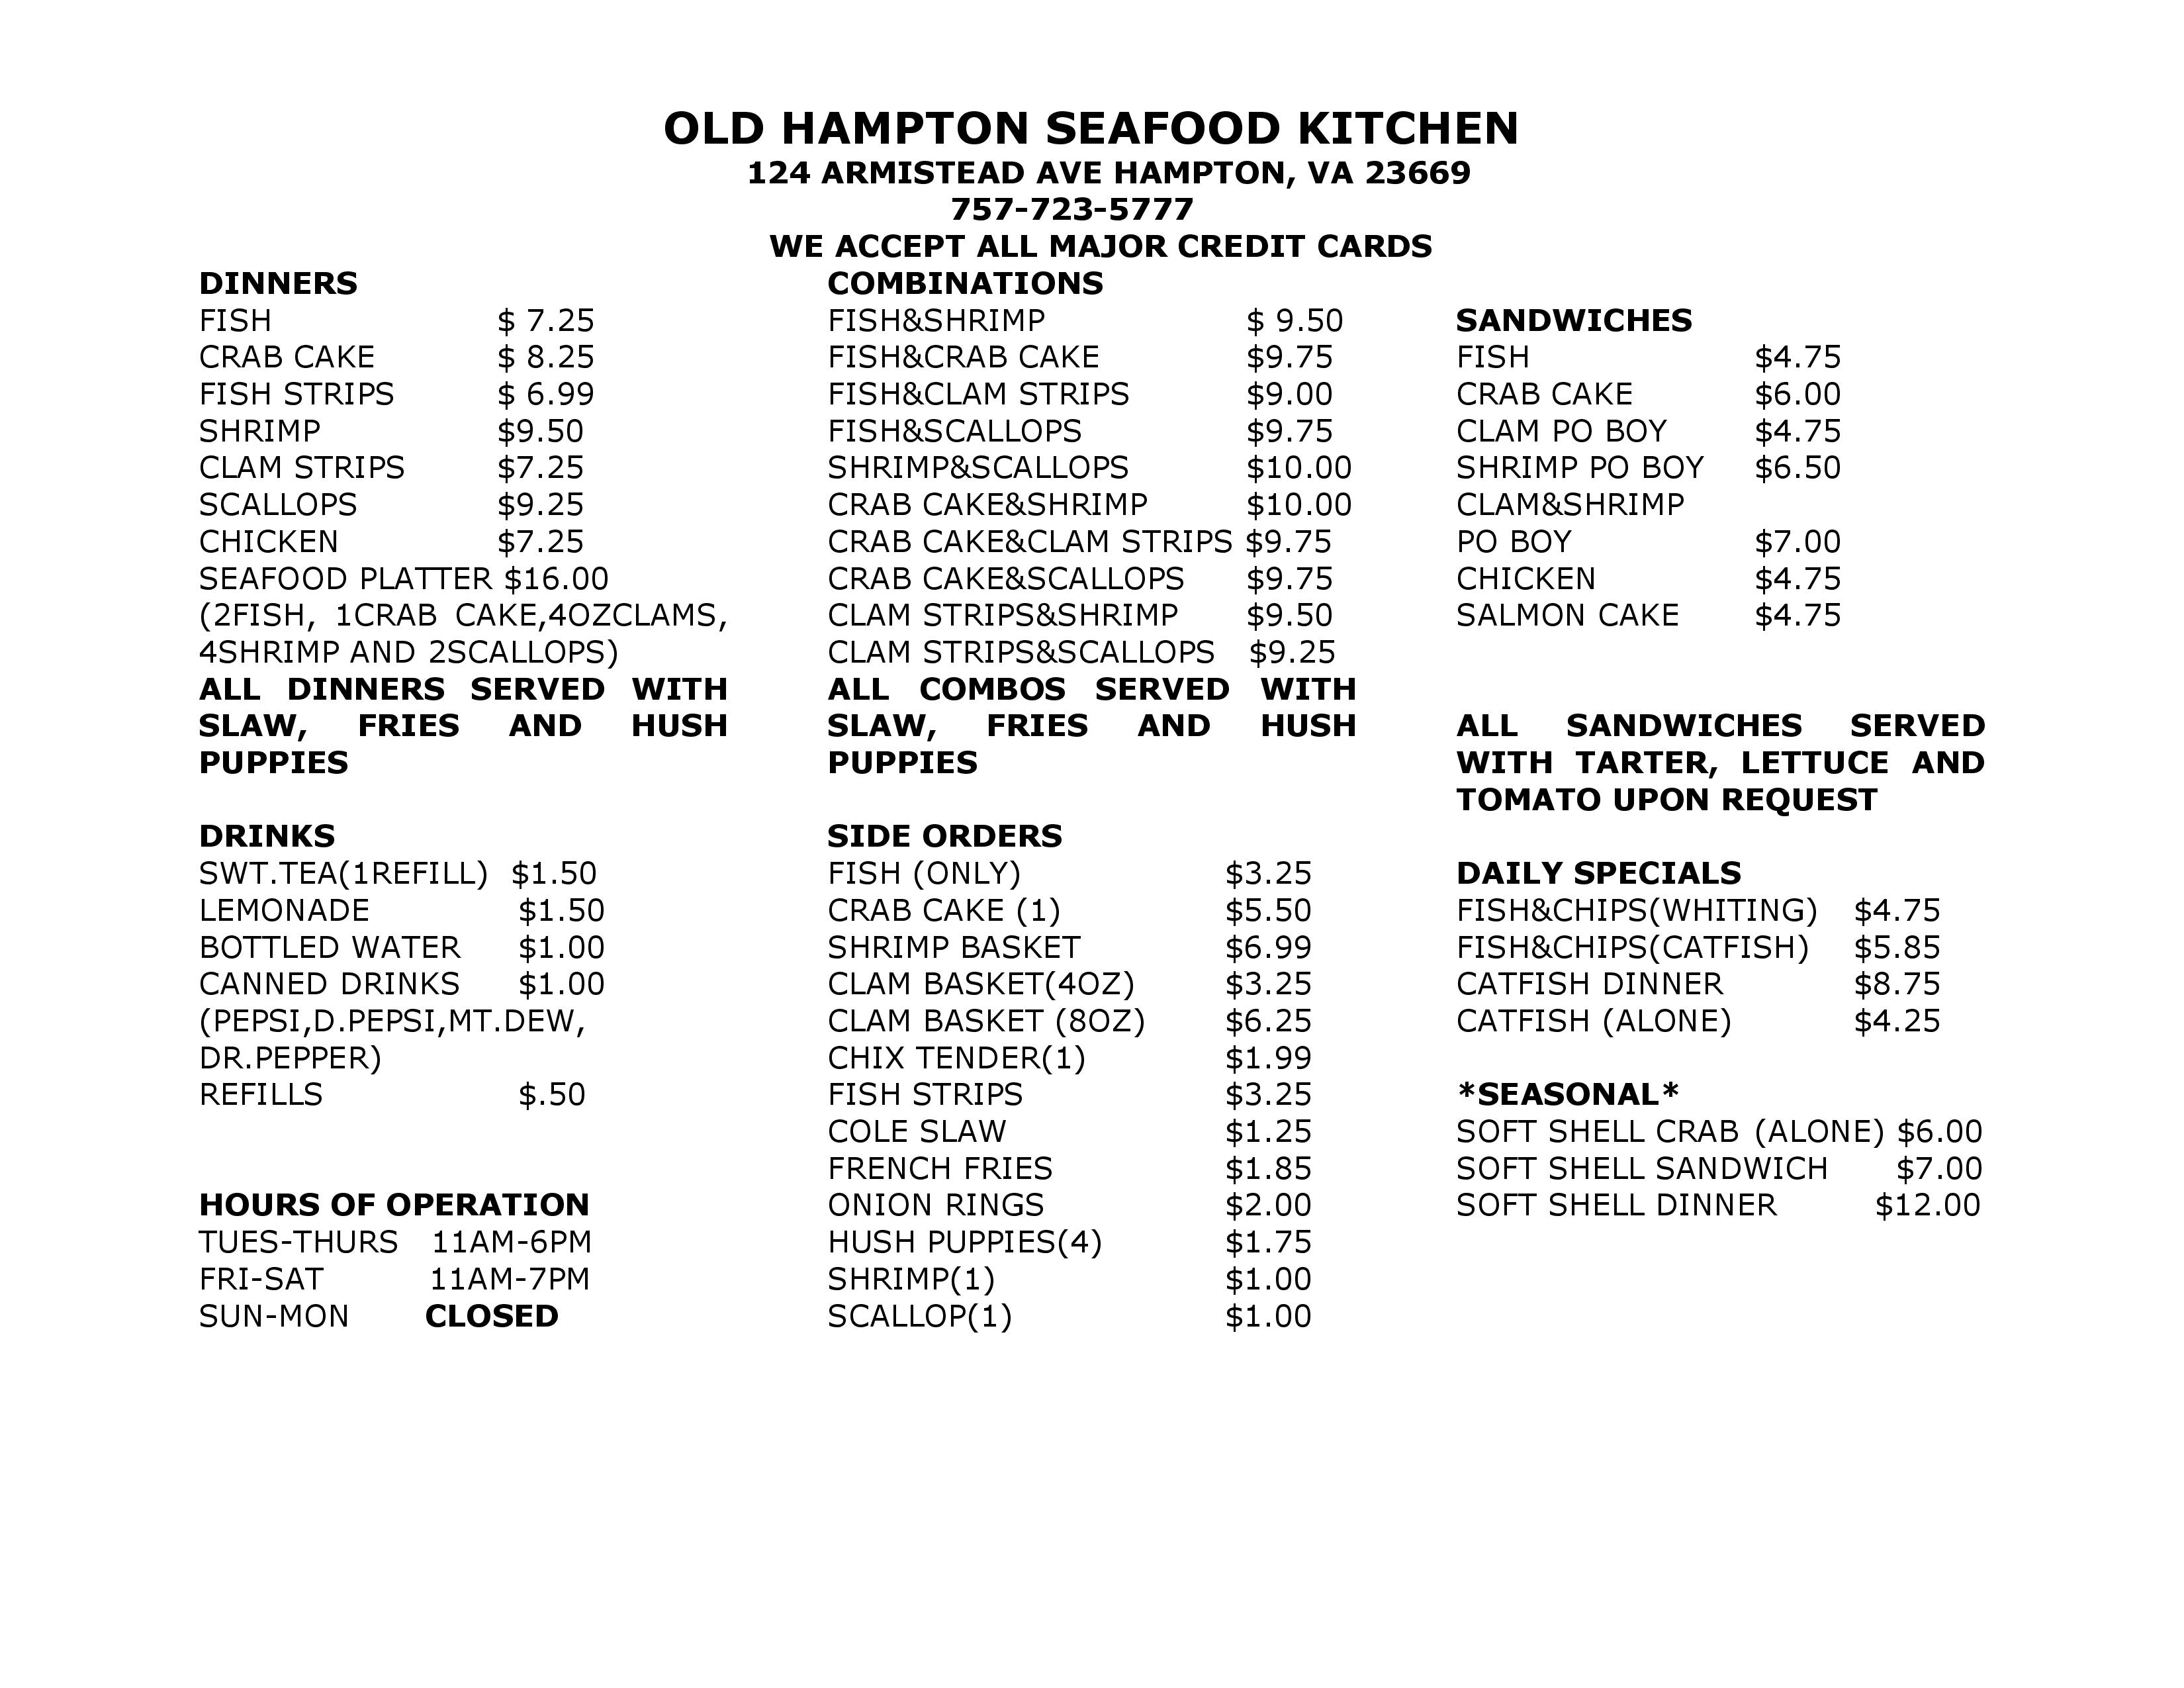 Old Hampton Seafood Kitchen Menu - Urbanspoon/Zomato